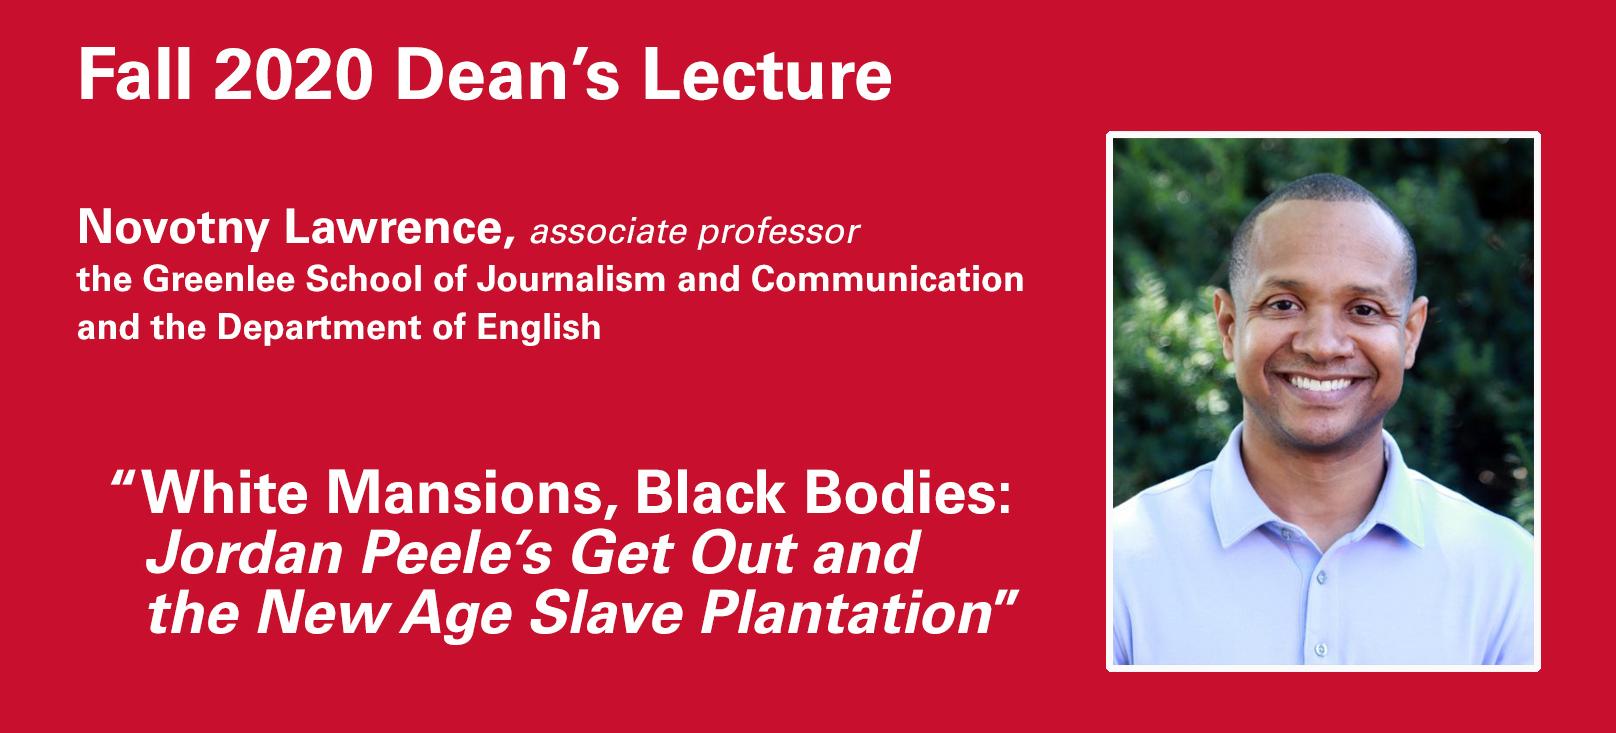 Deans Lecture Header